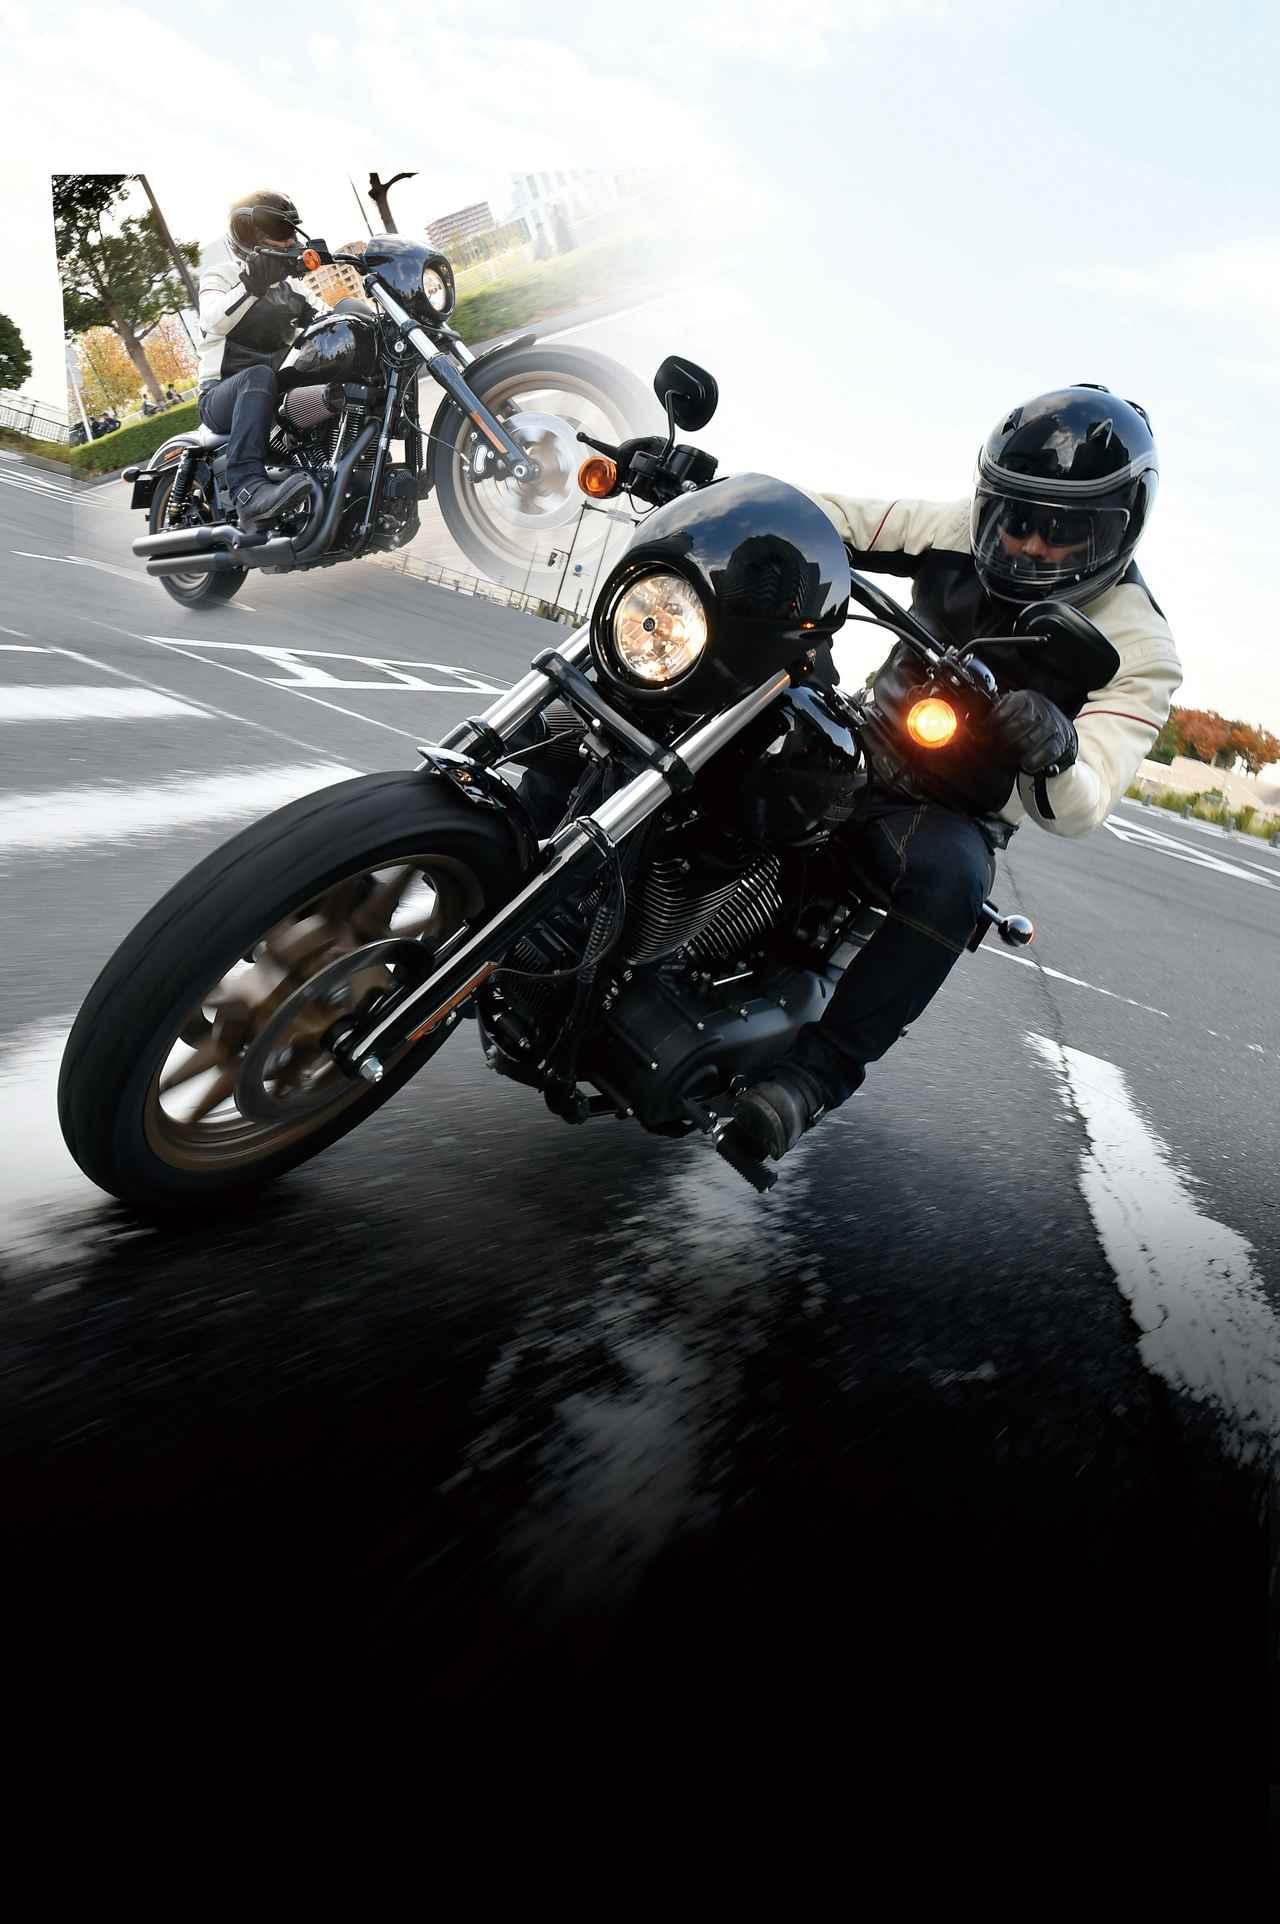 Images : 1番目の画像 - HARLEY-DAVIDSON LOW RIDER S - webオートバイ